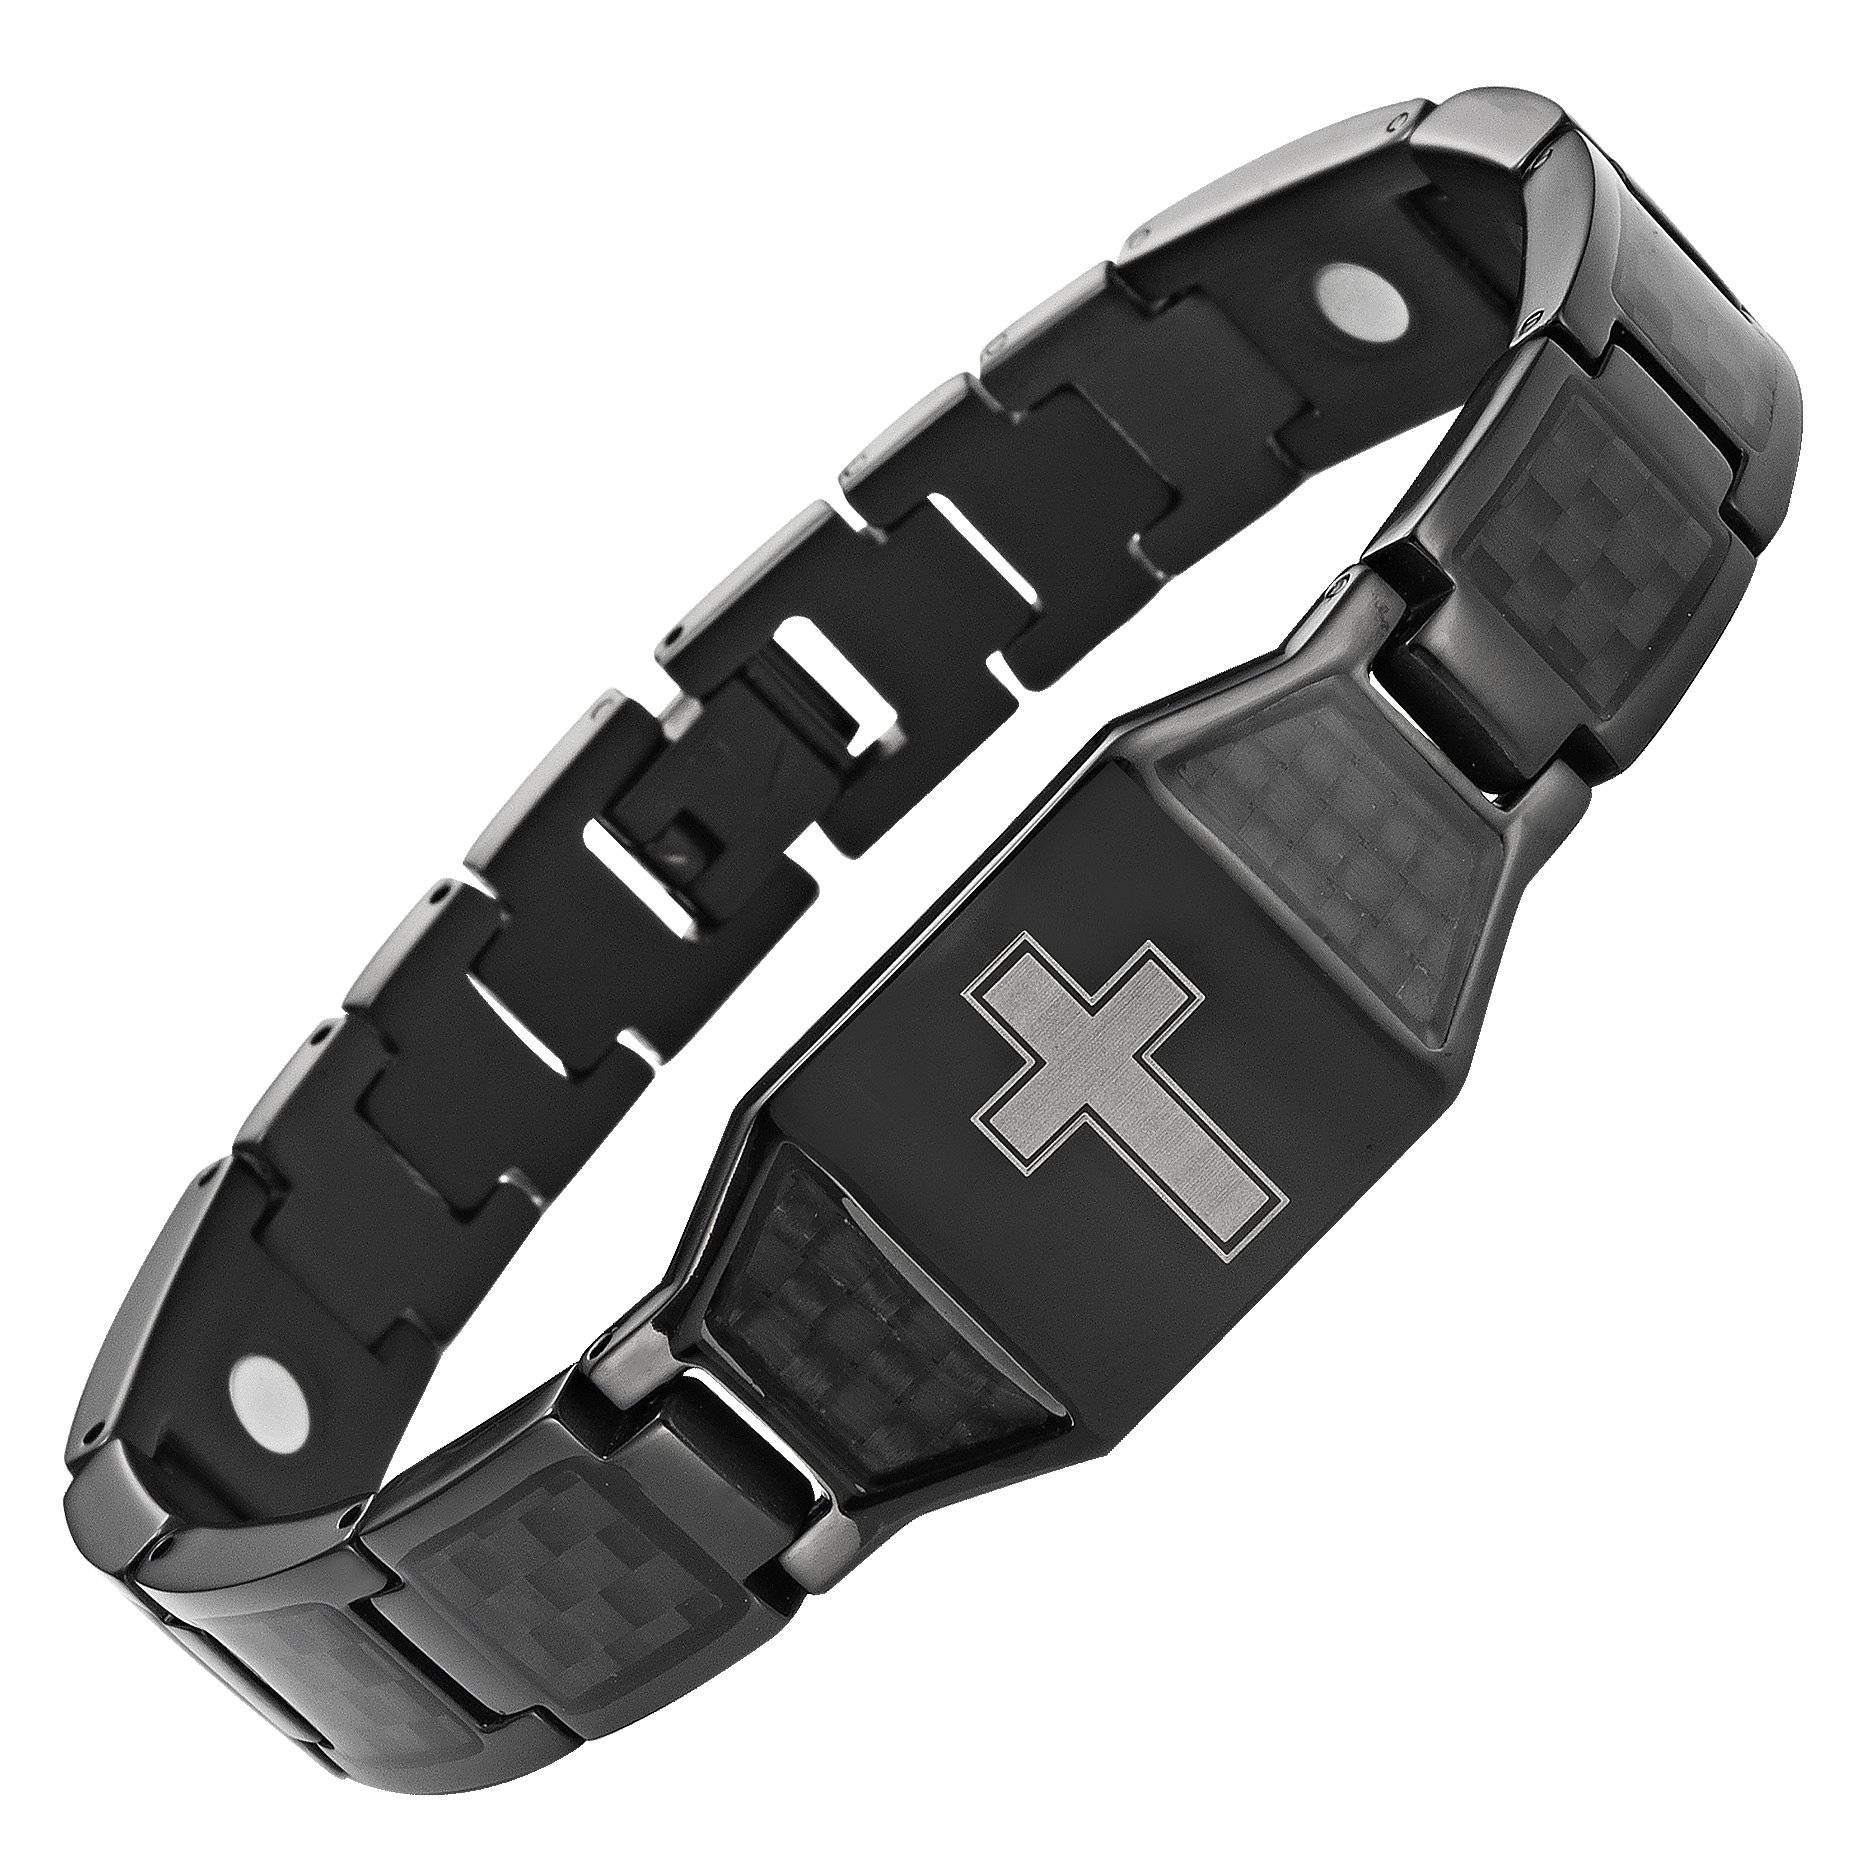 Willis Judd New Mens Black Titanium Magnetic Christian Cross Bracelet with Black Carbon Fiber Insets in Black Velvet Gift Box + Free Link Removal Tool